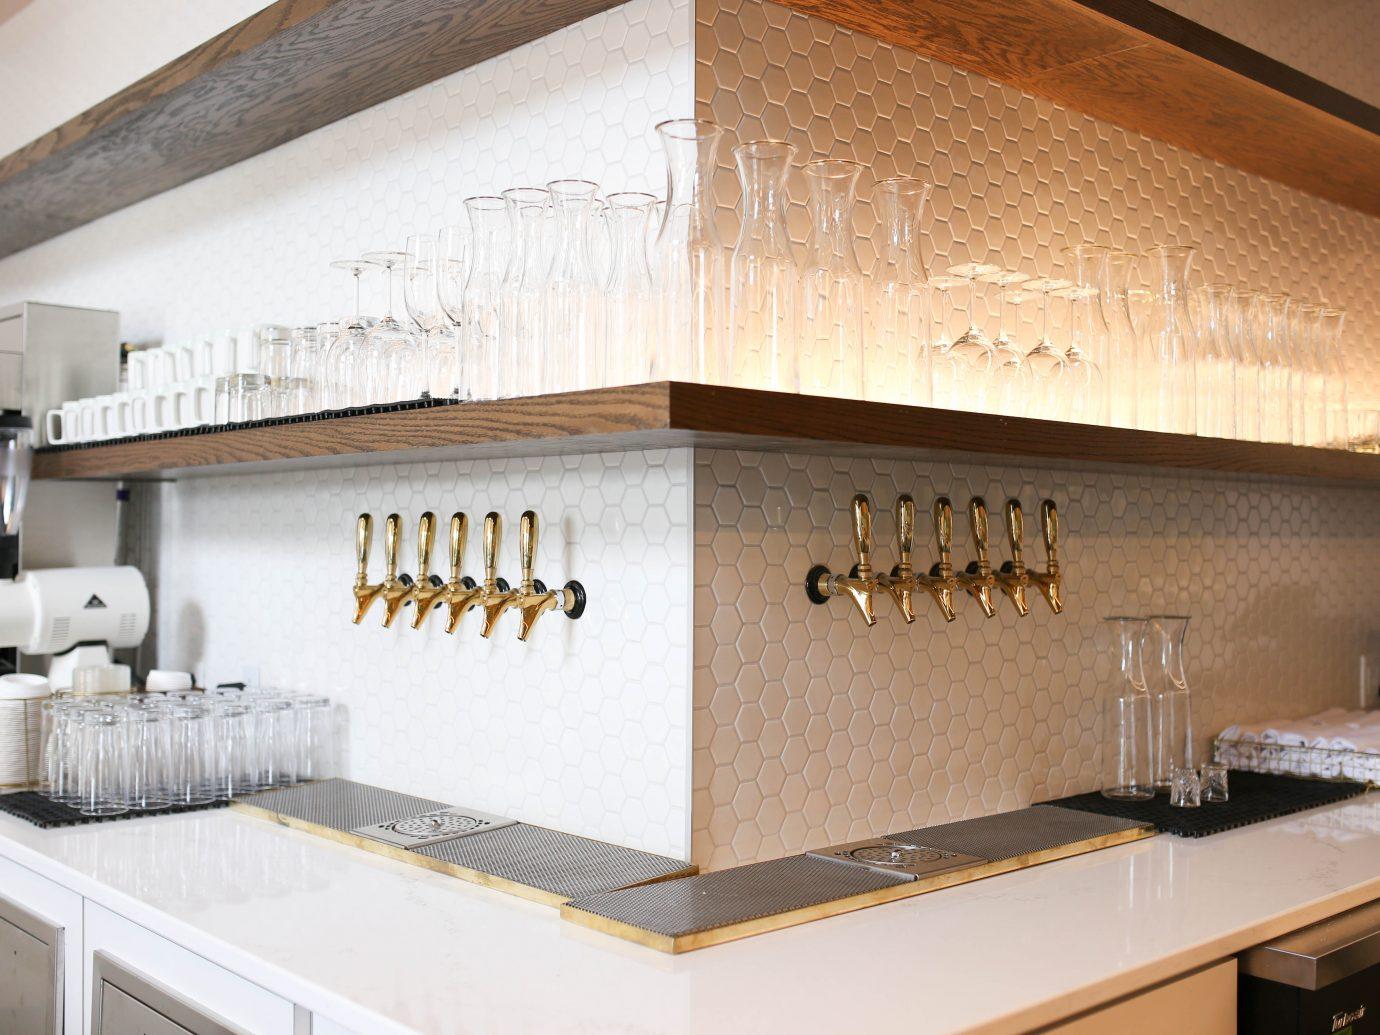 On tap beverages in a corner